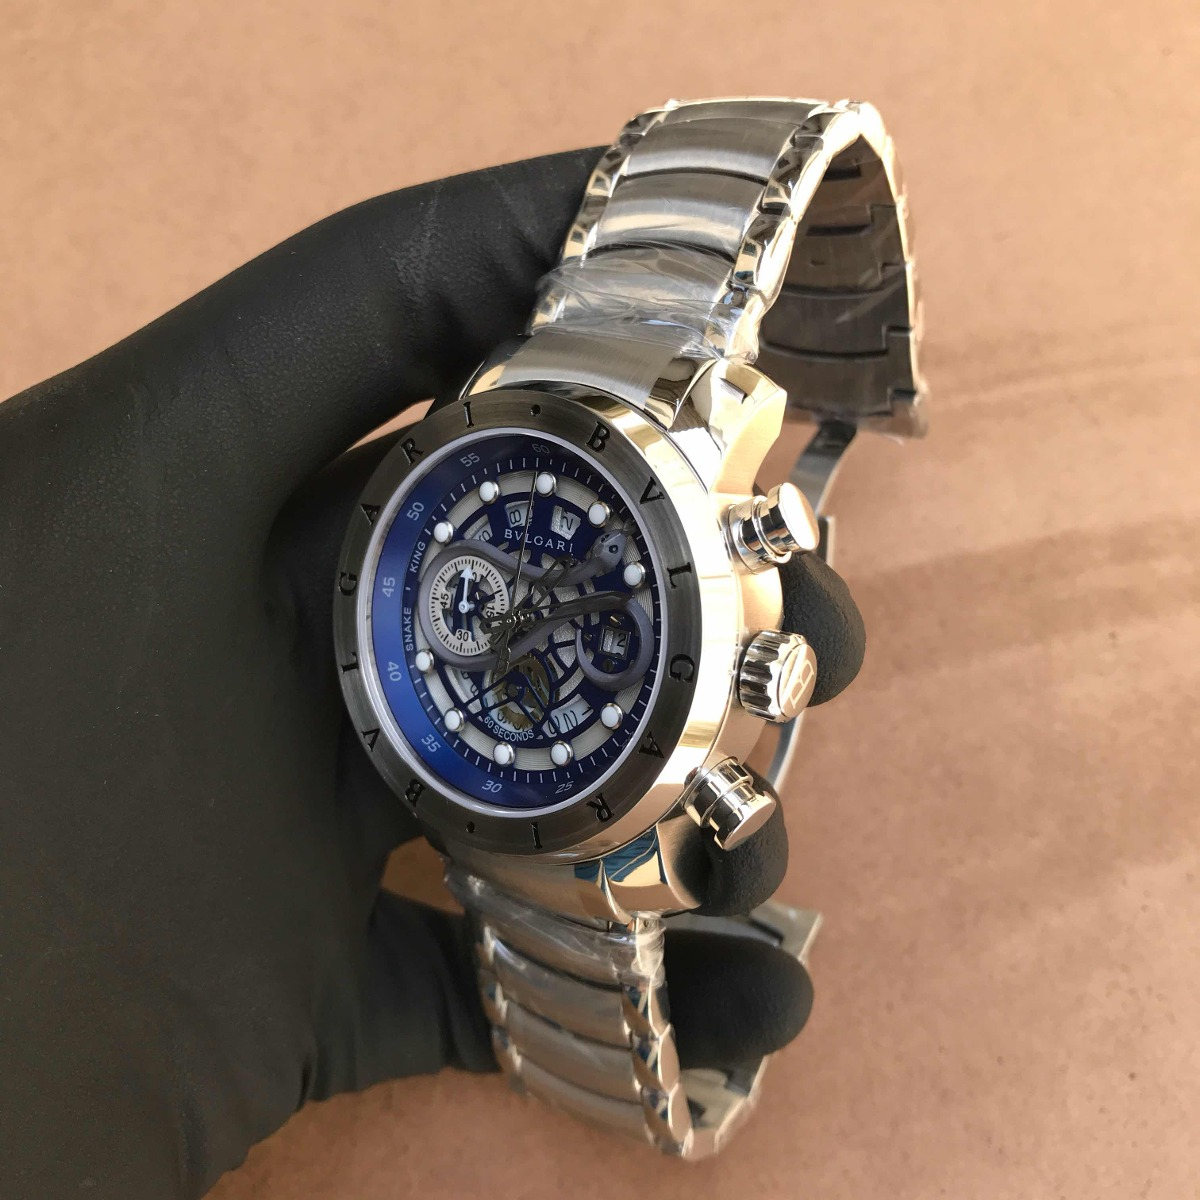 fadb84e3be3 Relógio Bvlgari Iron Man Cobra Prata